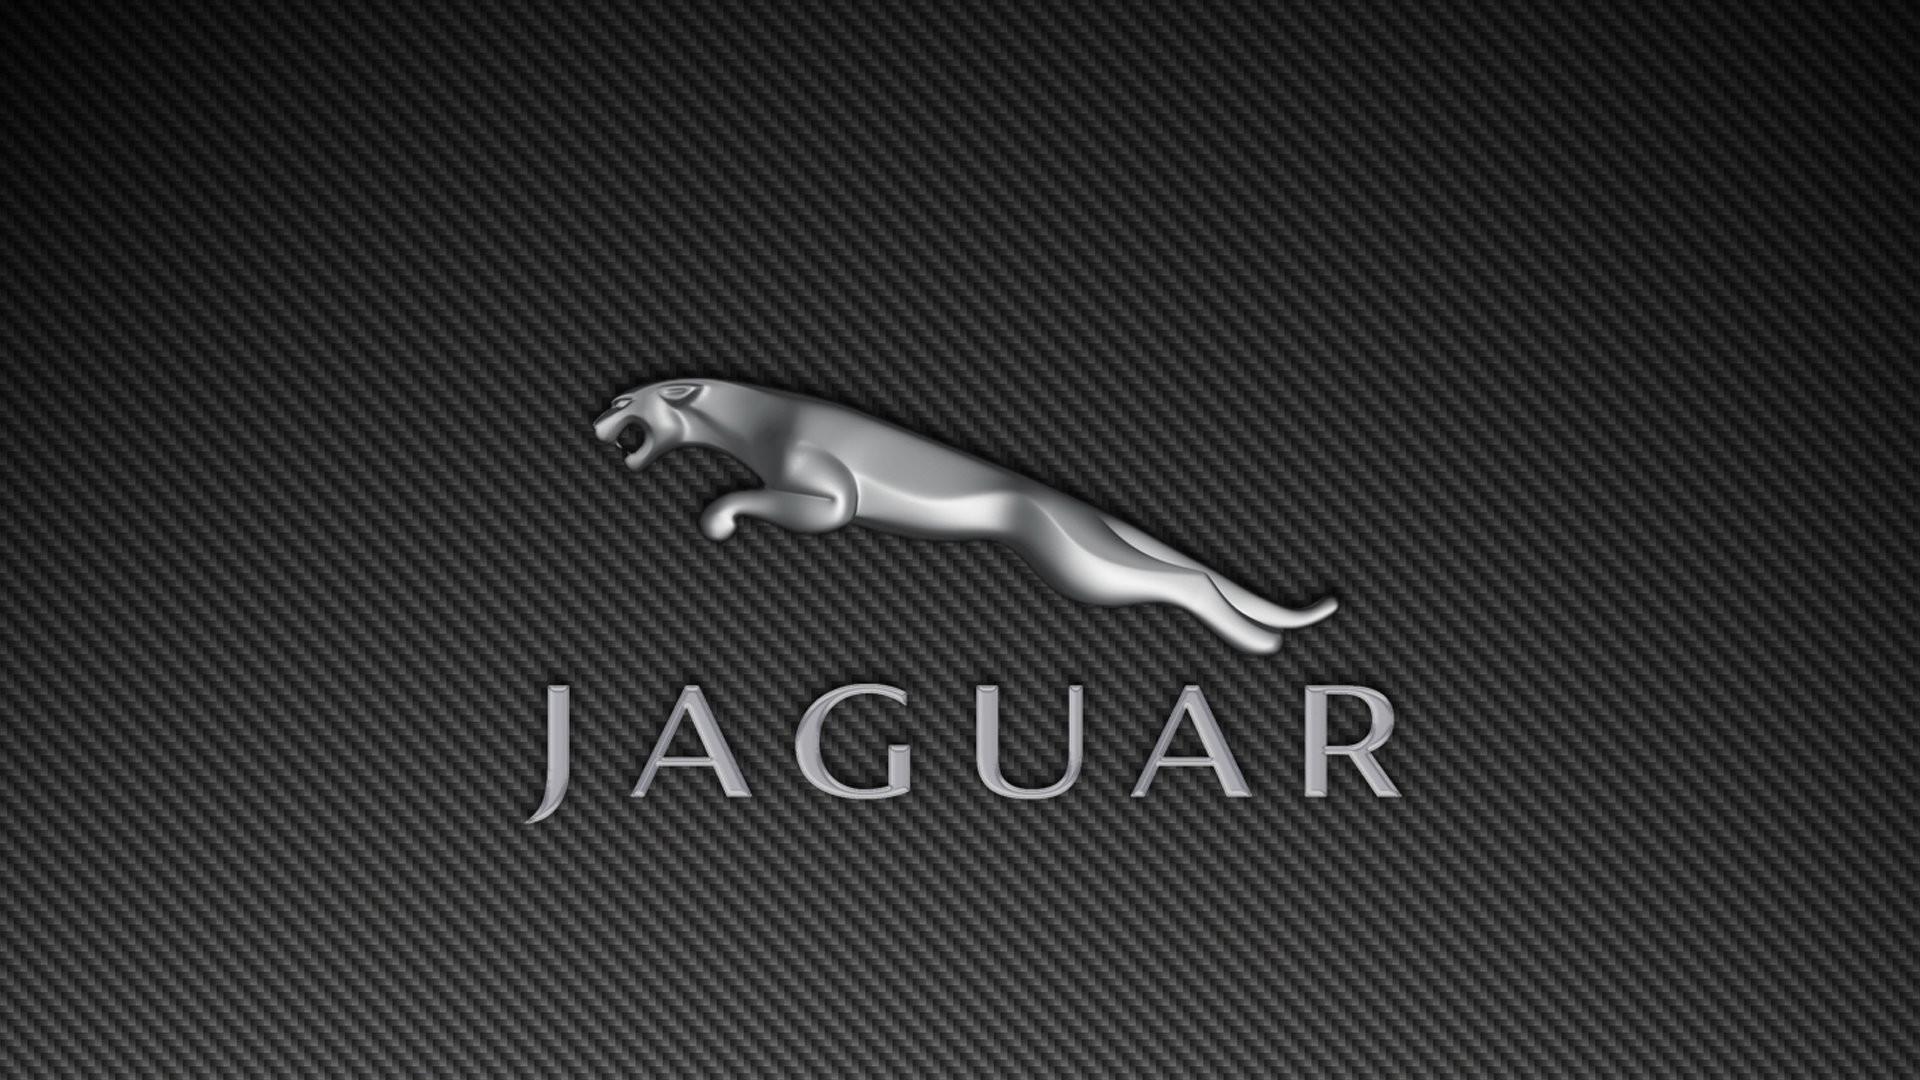 Jaguar Logo HD Wallpaper 1080p Wallpaper